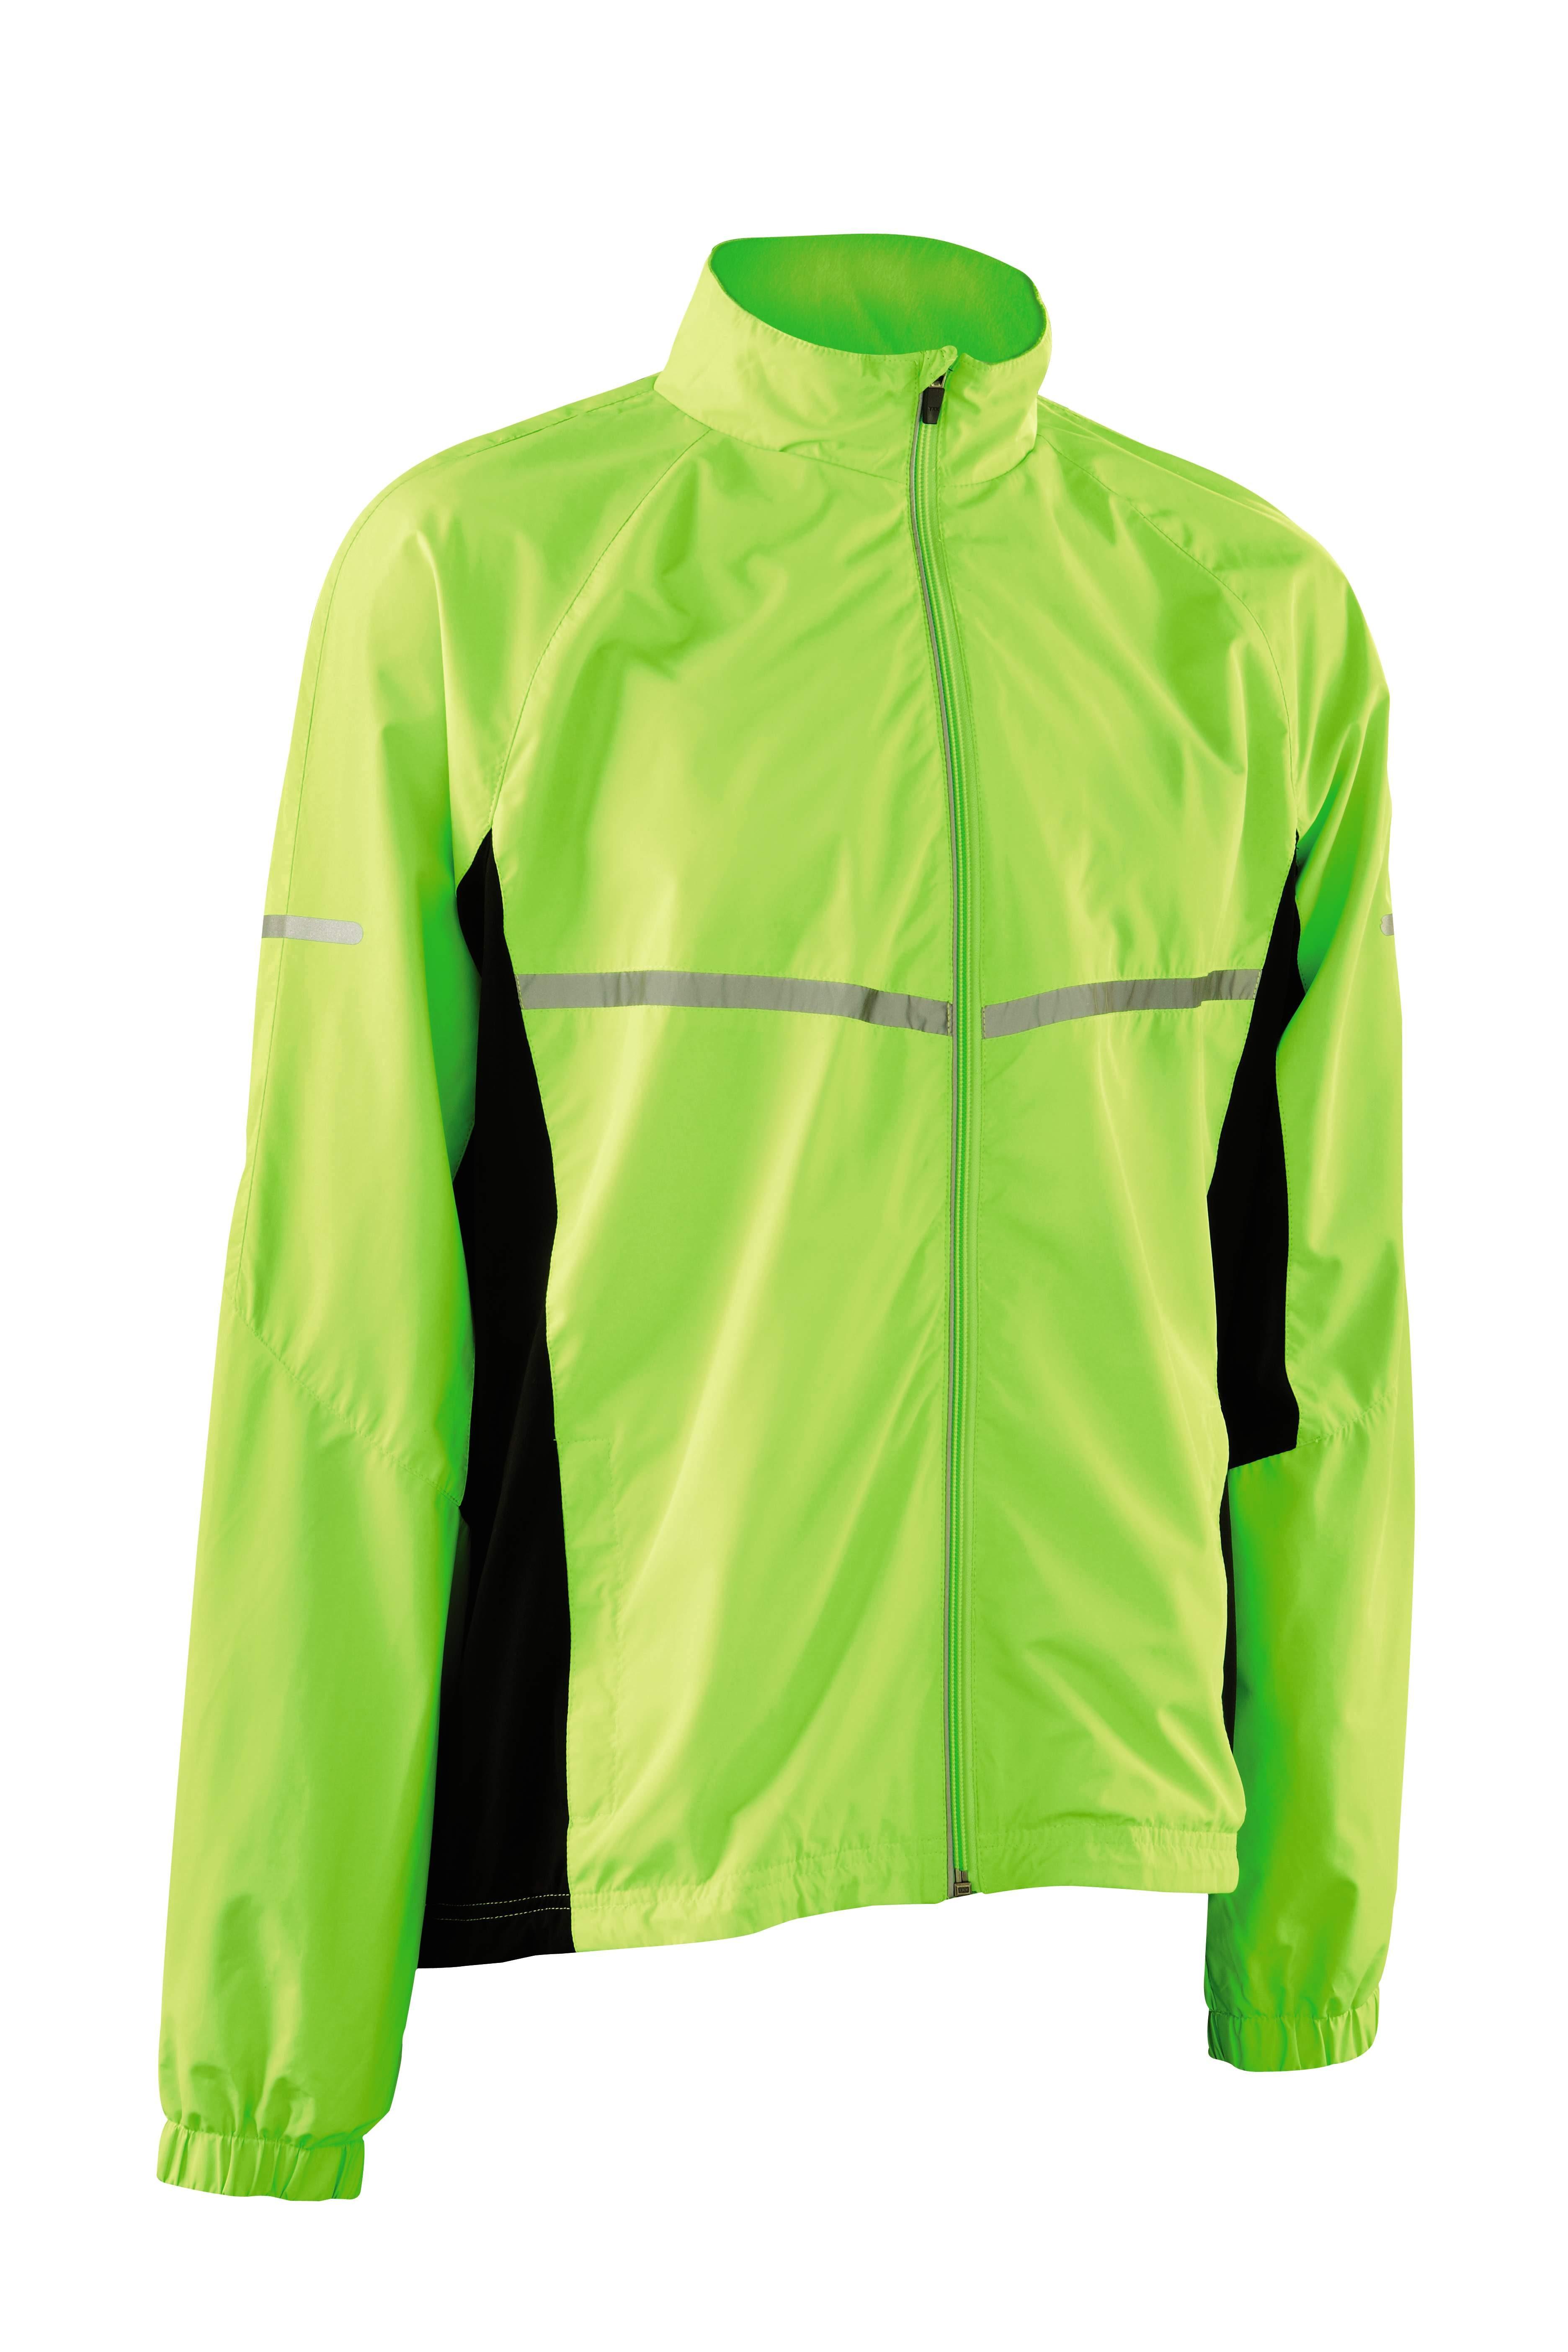 Aldi running jacket, £19.99